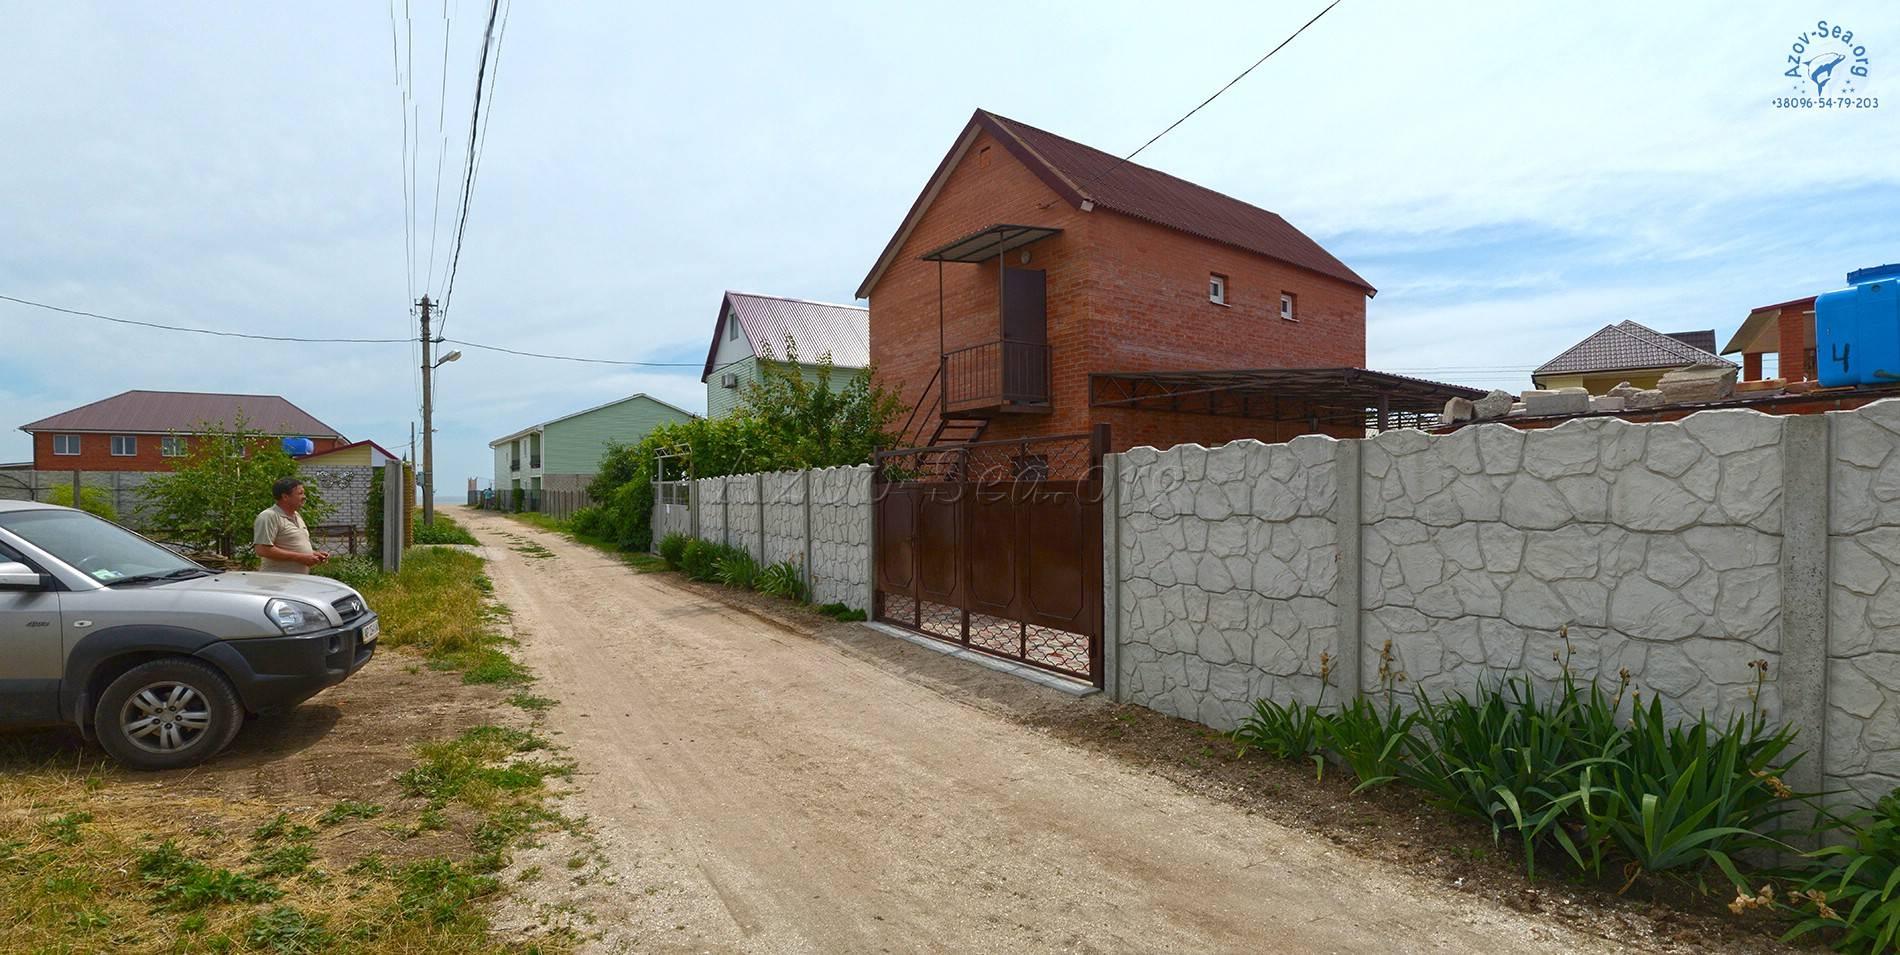 Степановка-1. Пансионат Марсель. Азовское море